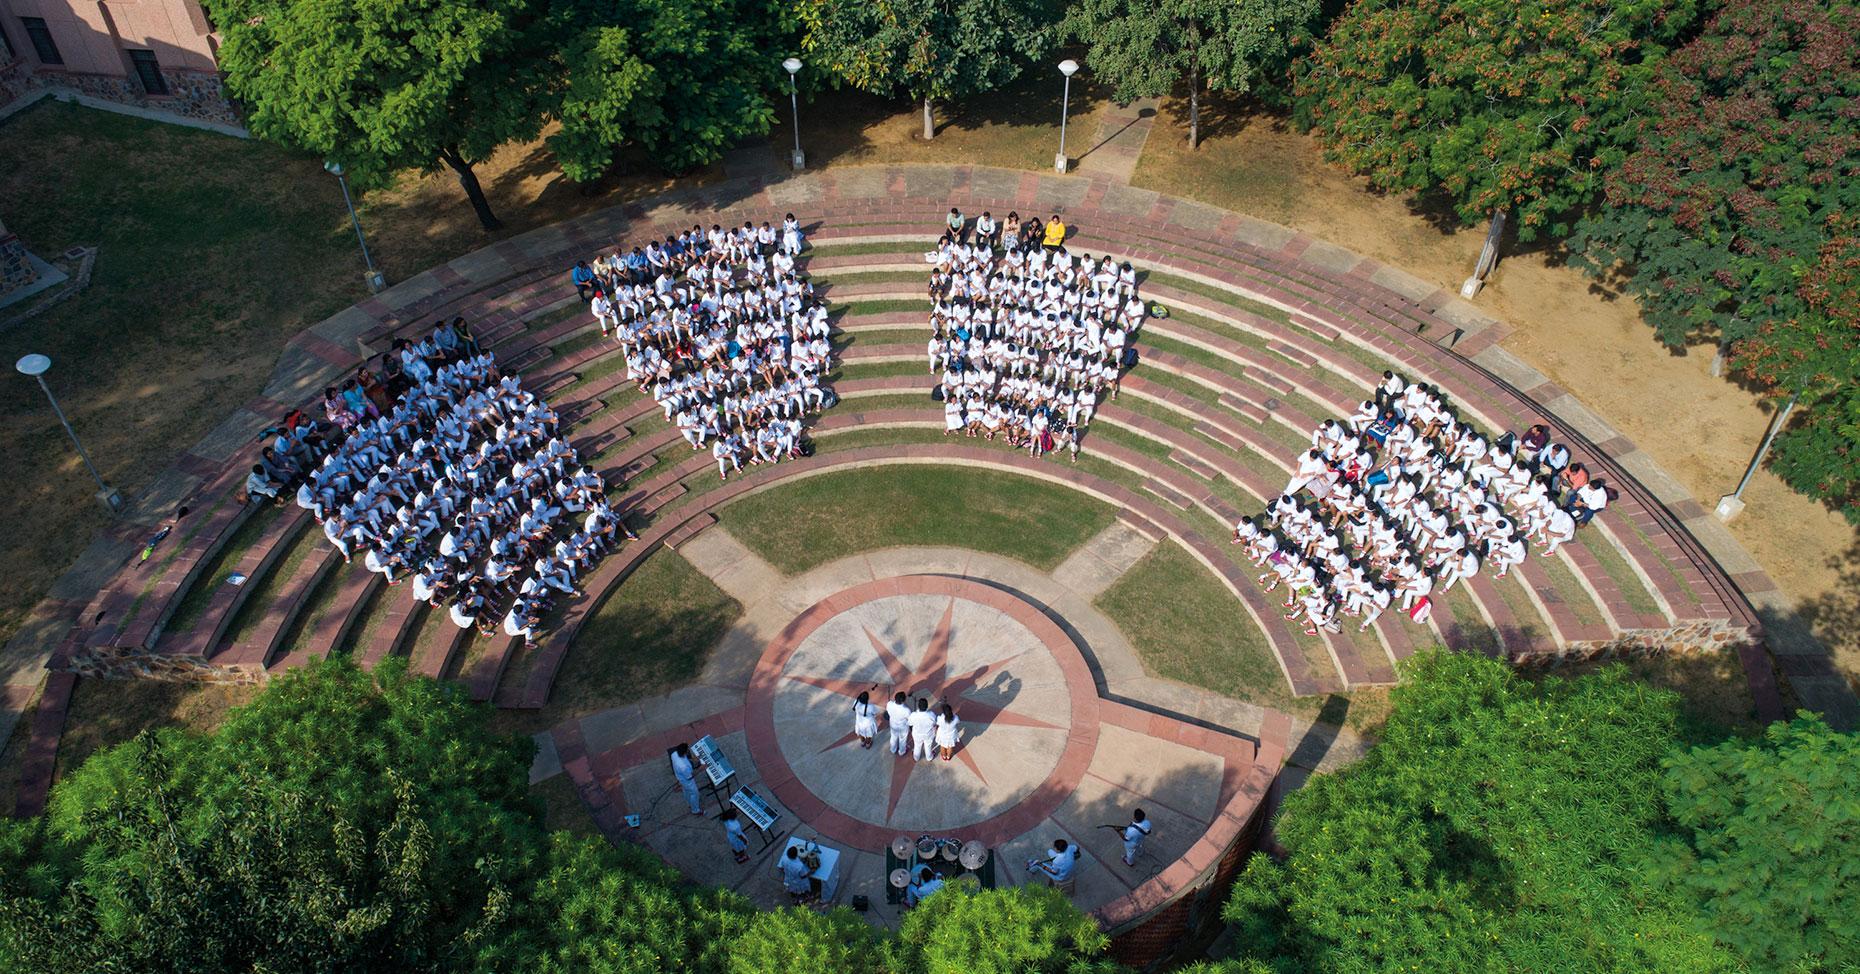 Best CBSE Boarding School near Rajasthan, Delhi NCR and Gurgaon